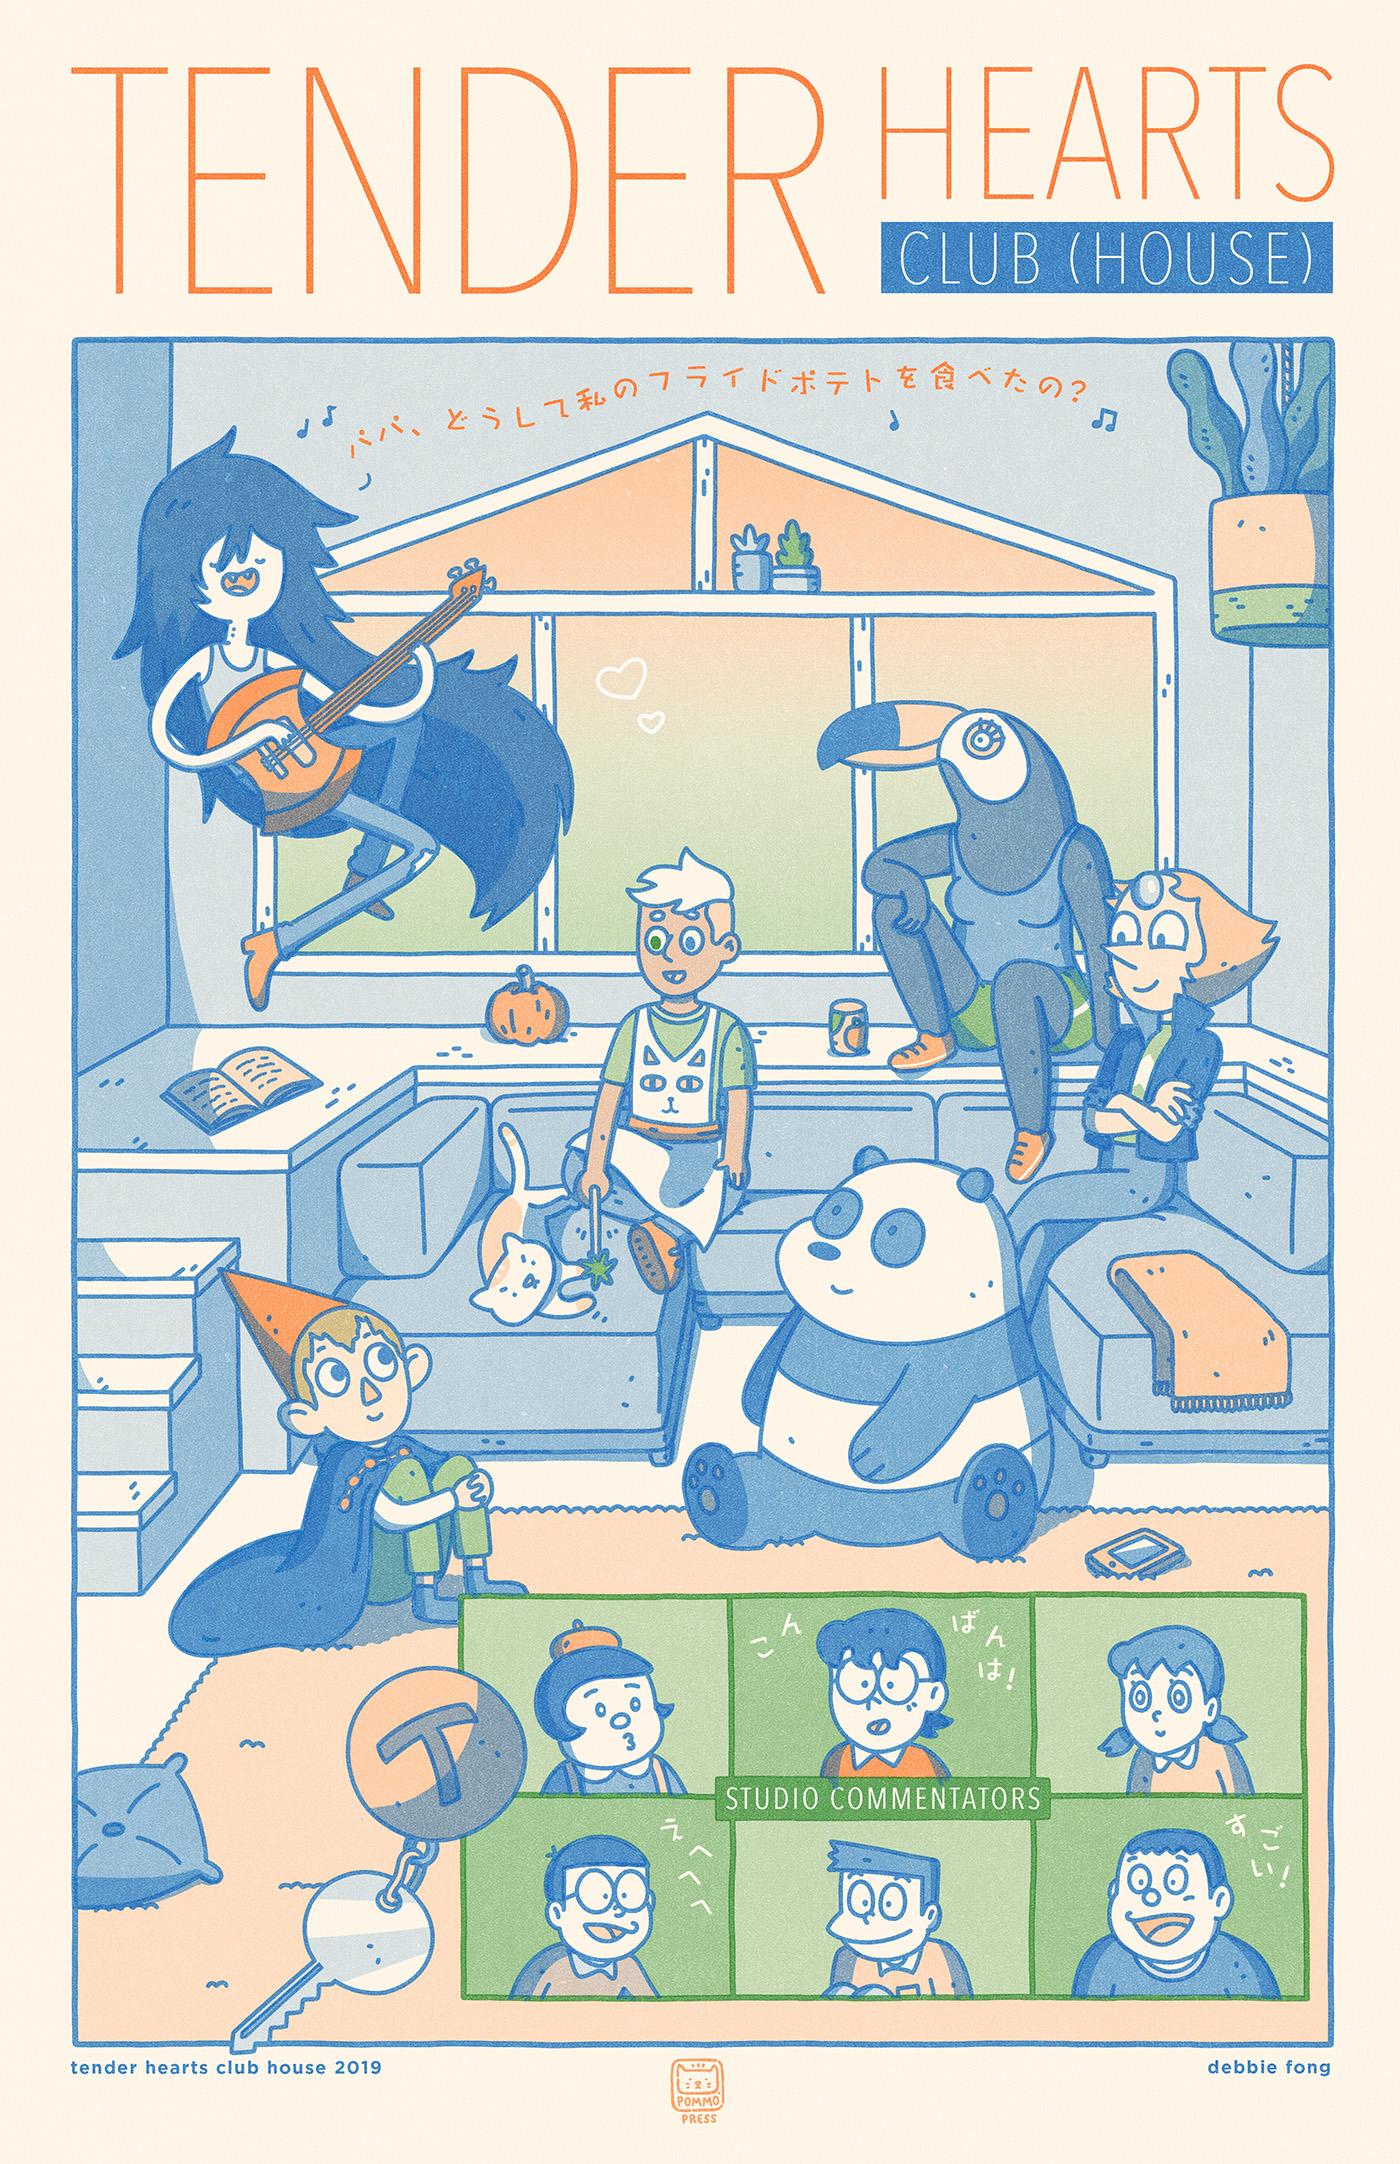 Tender Hearts Club House - Blue, Green, Orange